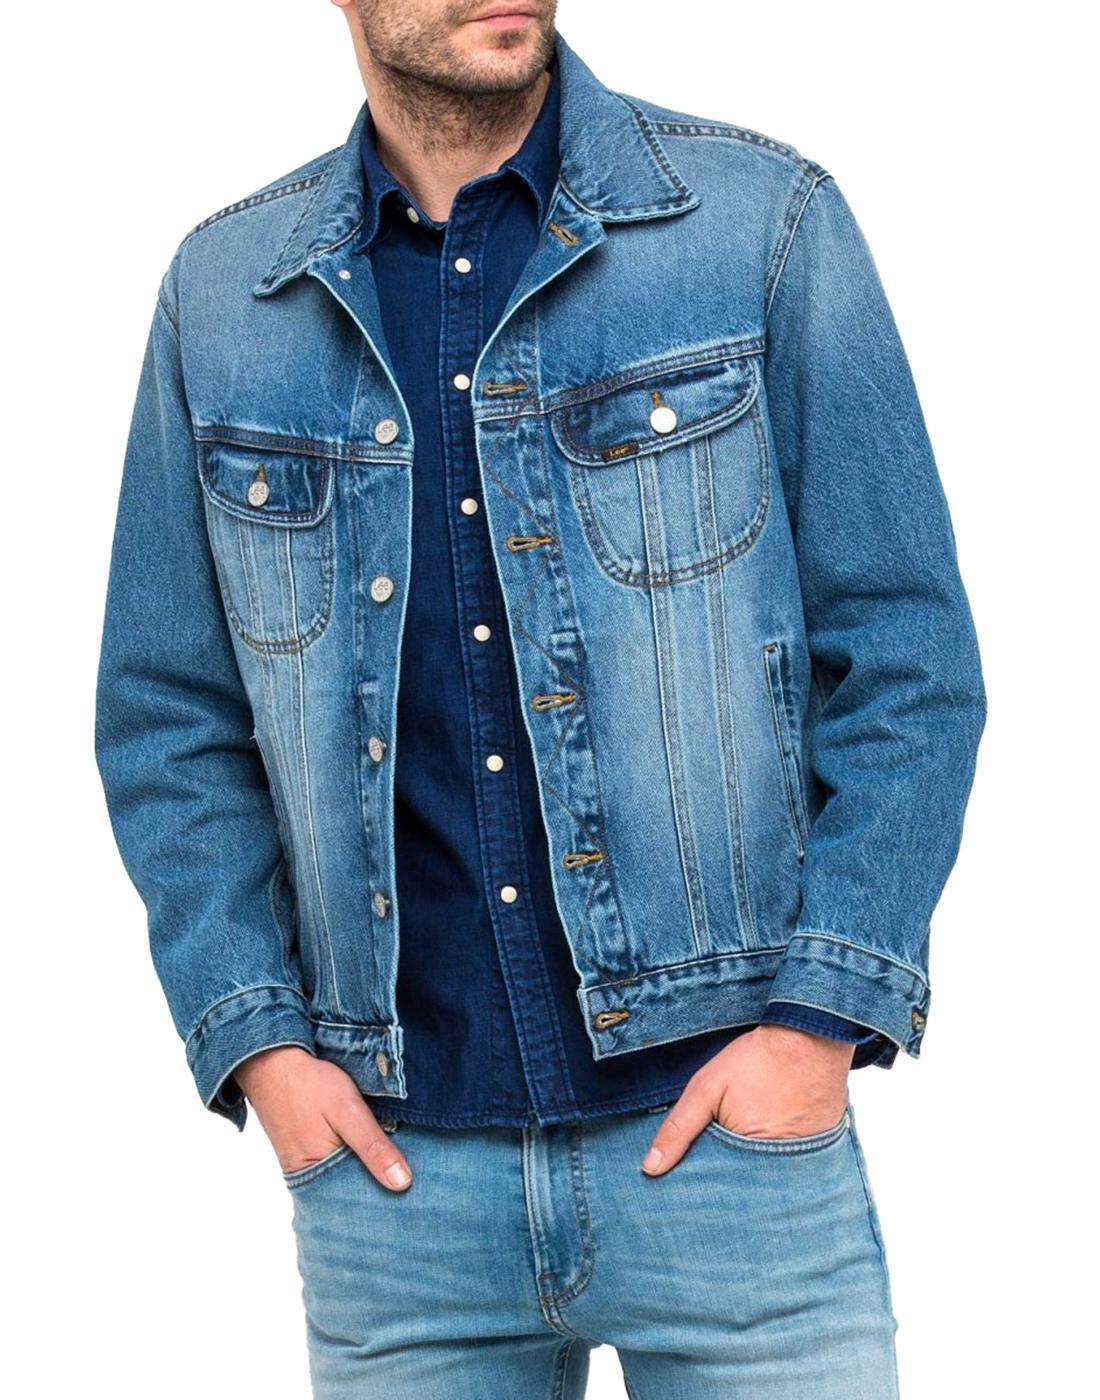 Rider LEE JEANS Retro 70s Rigid Denim Jacket Blue